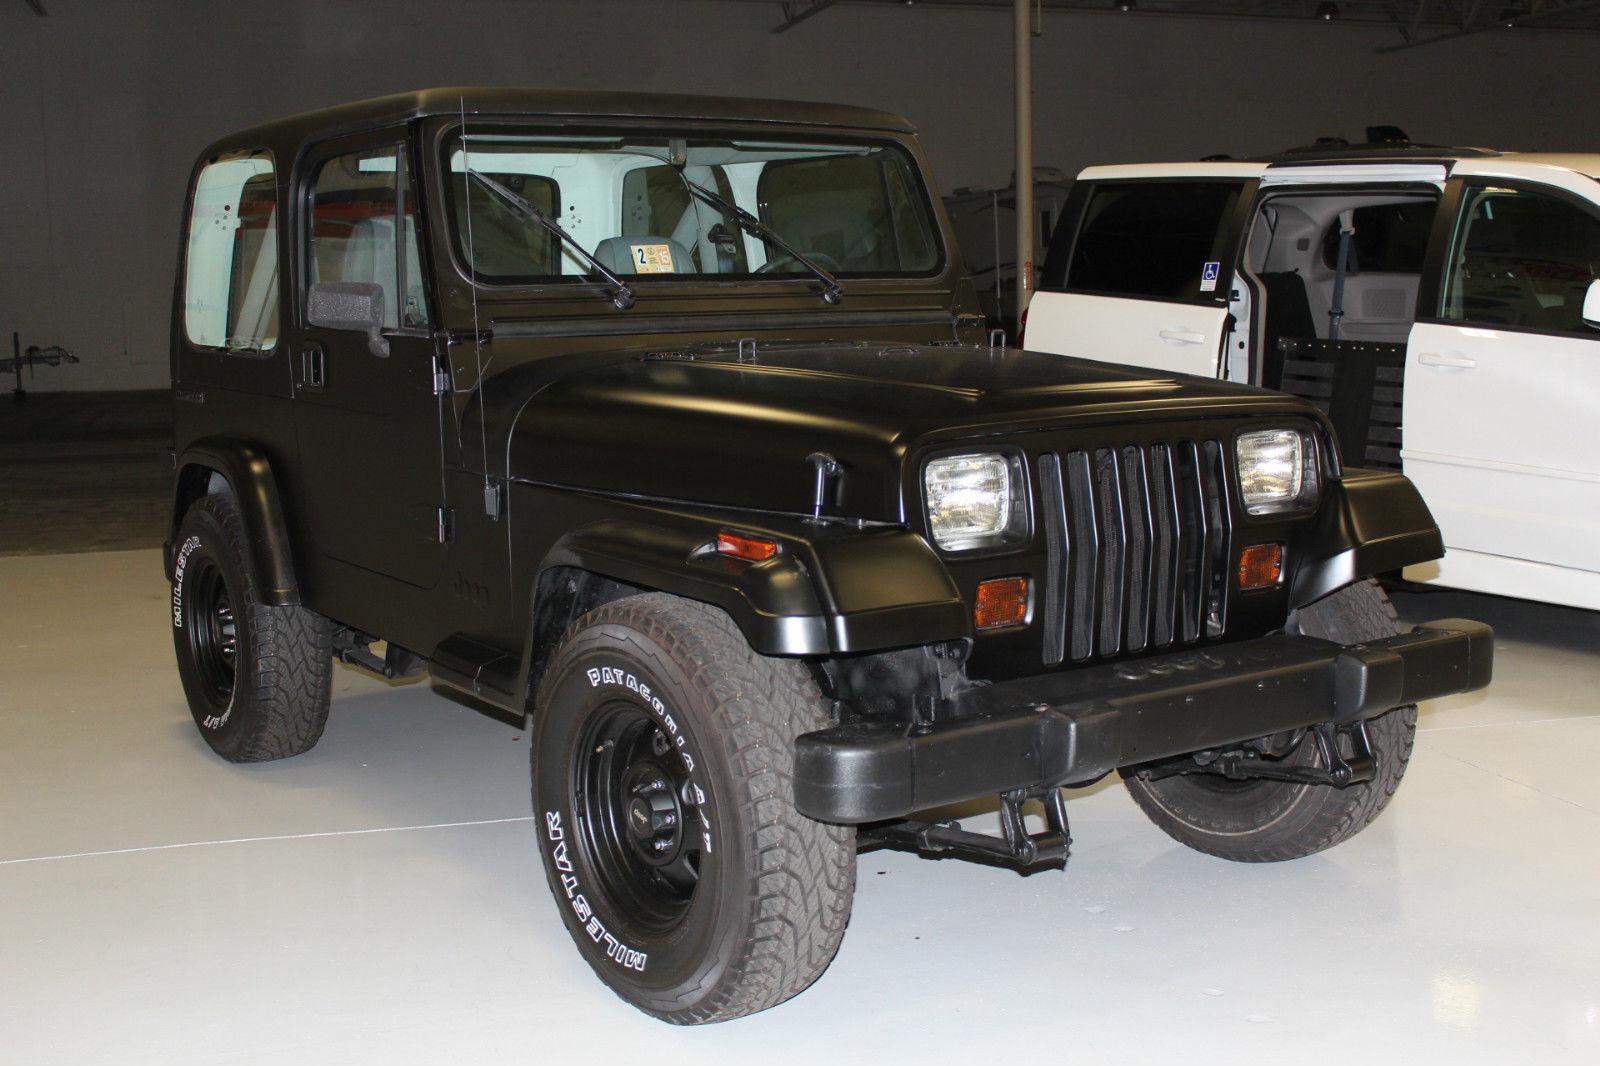 1990 Jeep Wrangler Base Sport Utility 2 Door 4 2l Black Hardtop New Tires Belts Classic Jeep